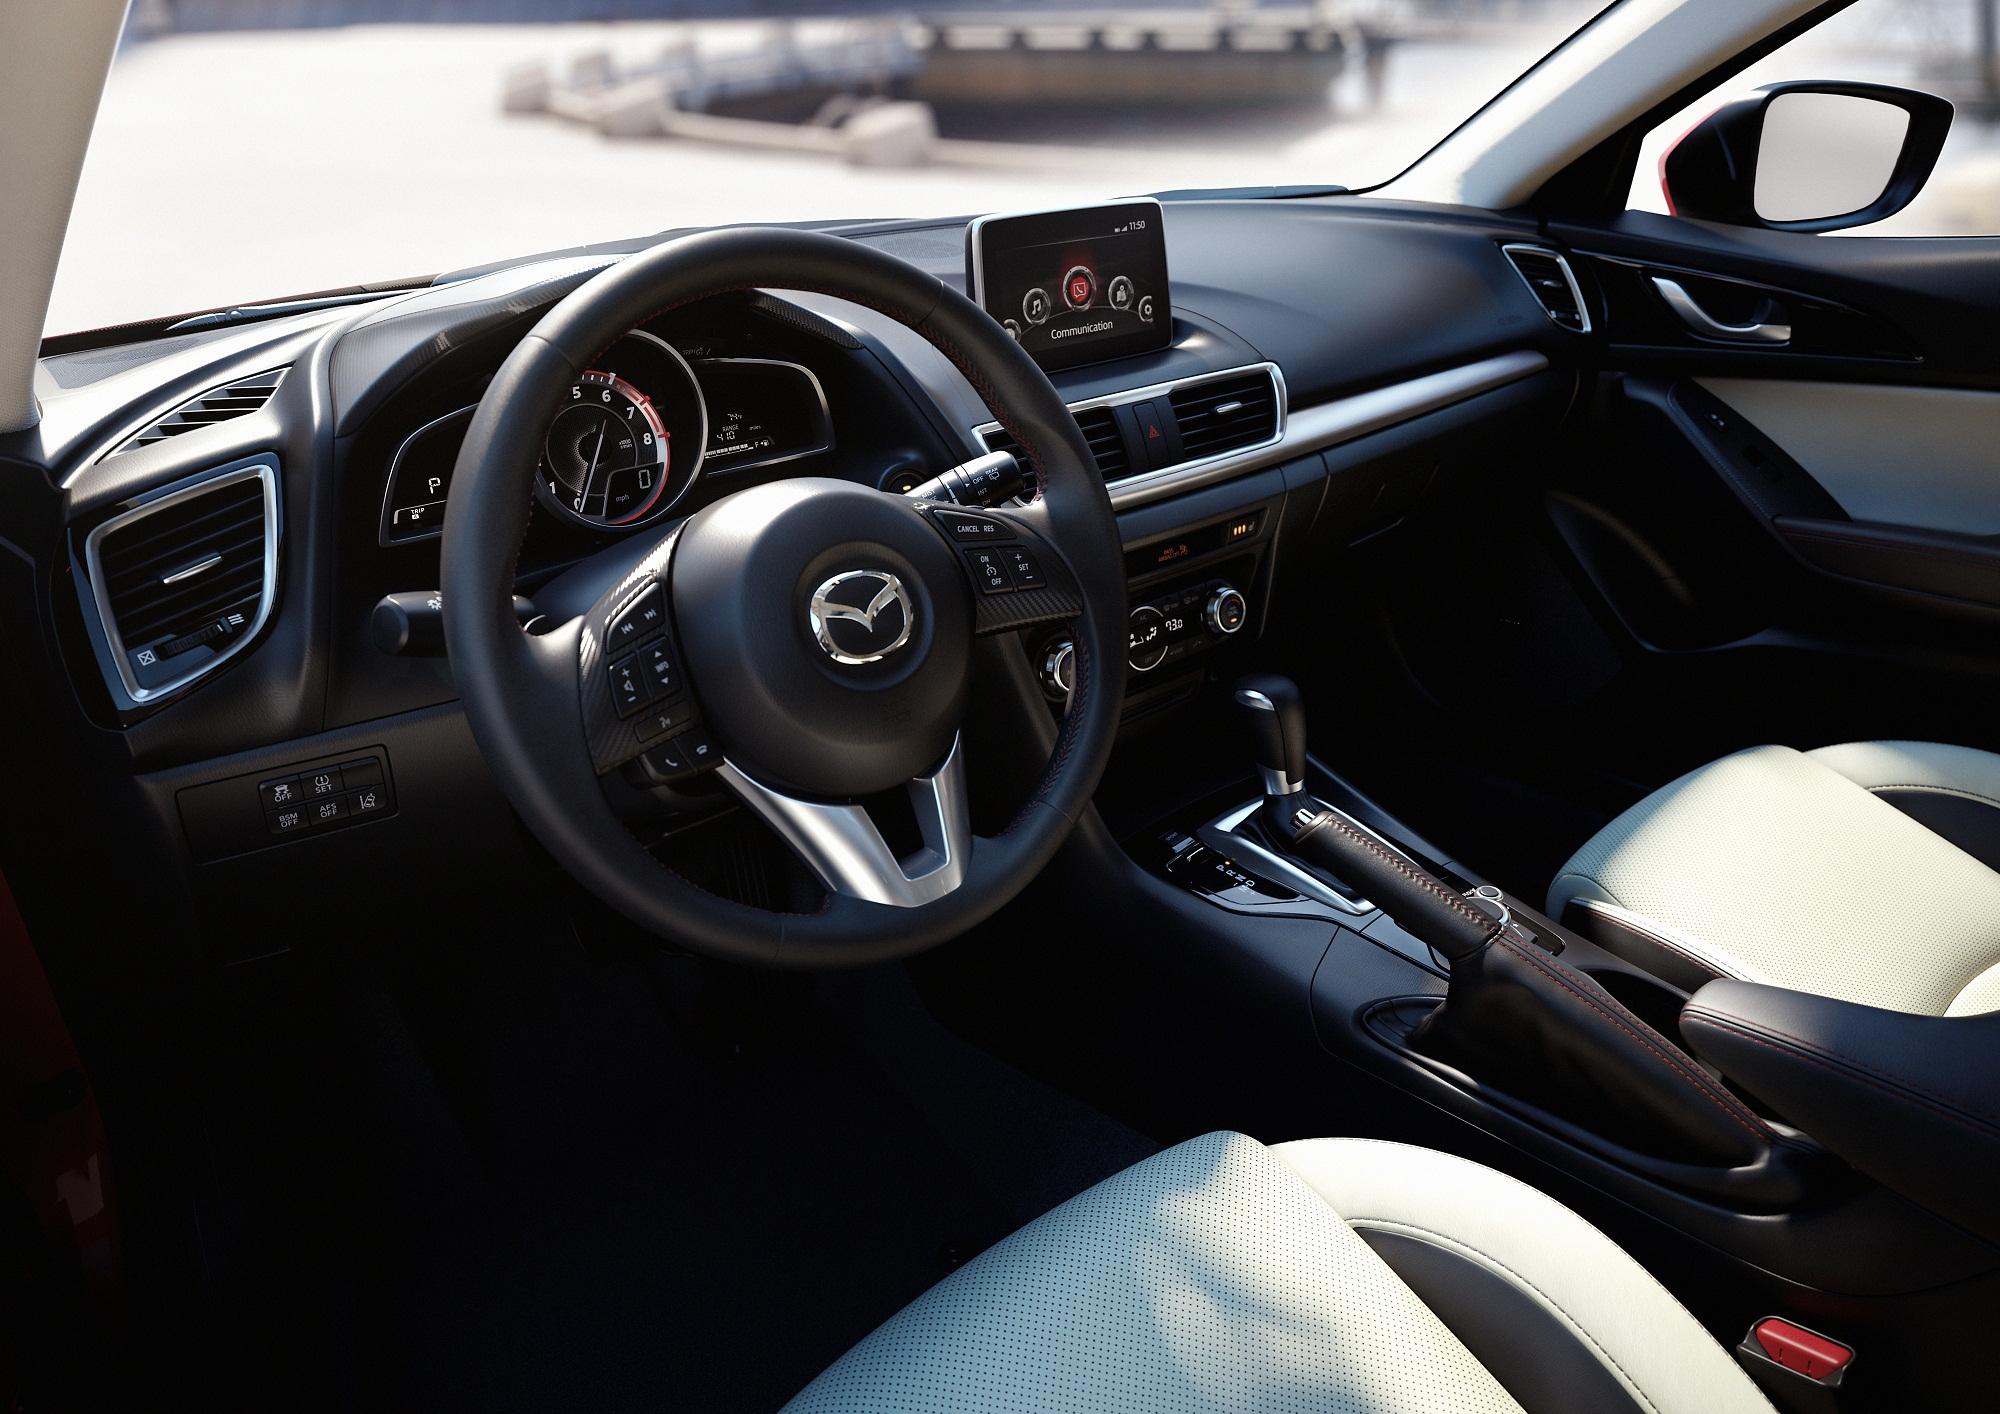 Mazda 3 2014 Hatchback White >> 2014 Mazda 3 review – WHEELS.ca